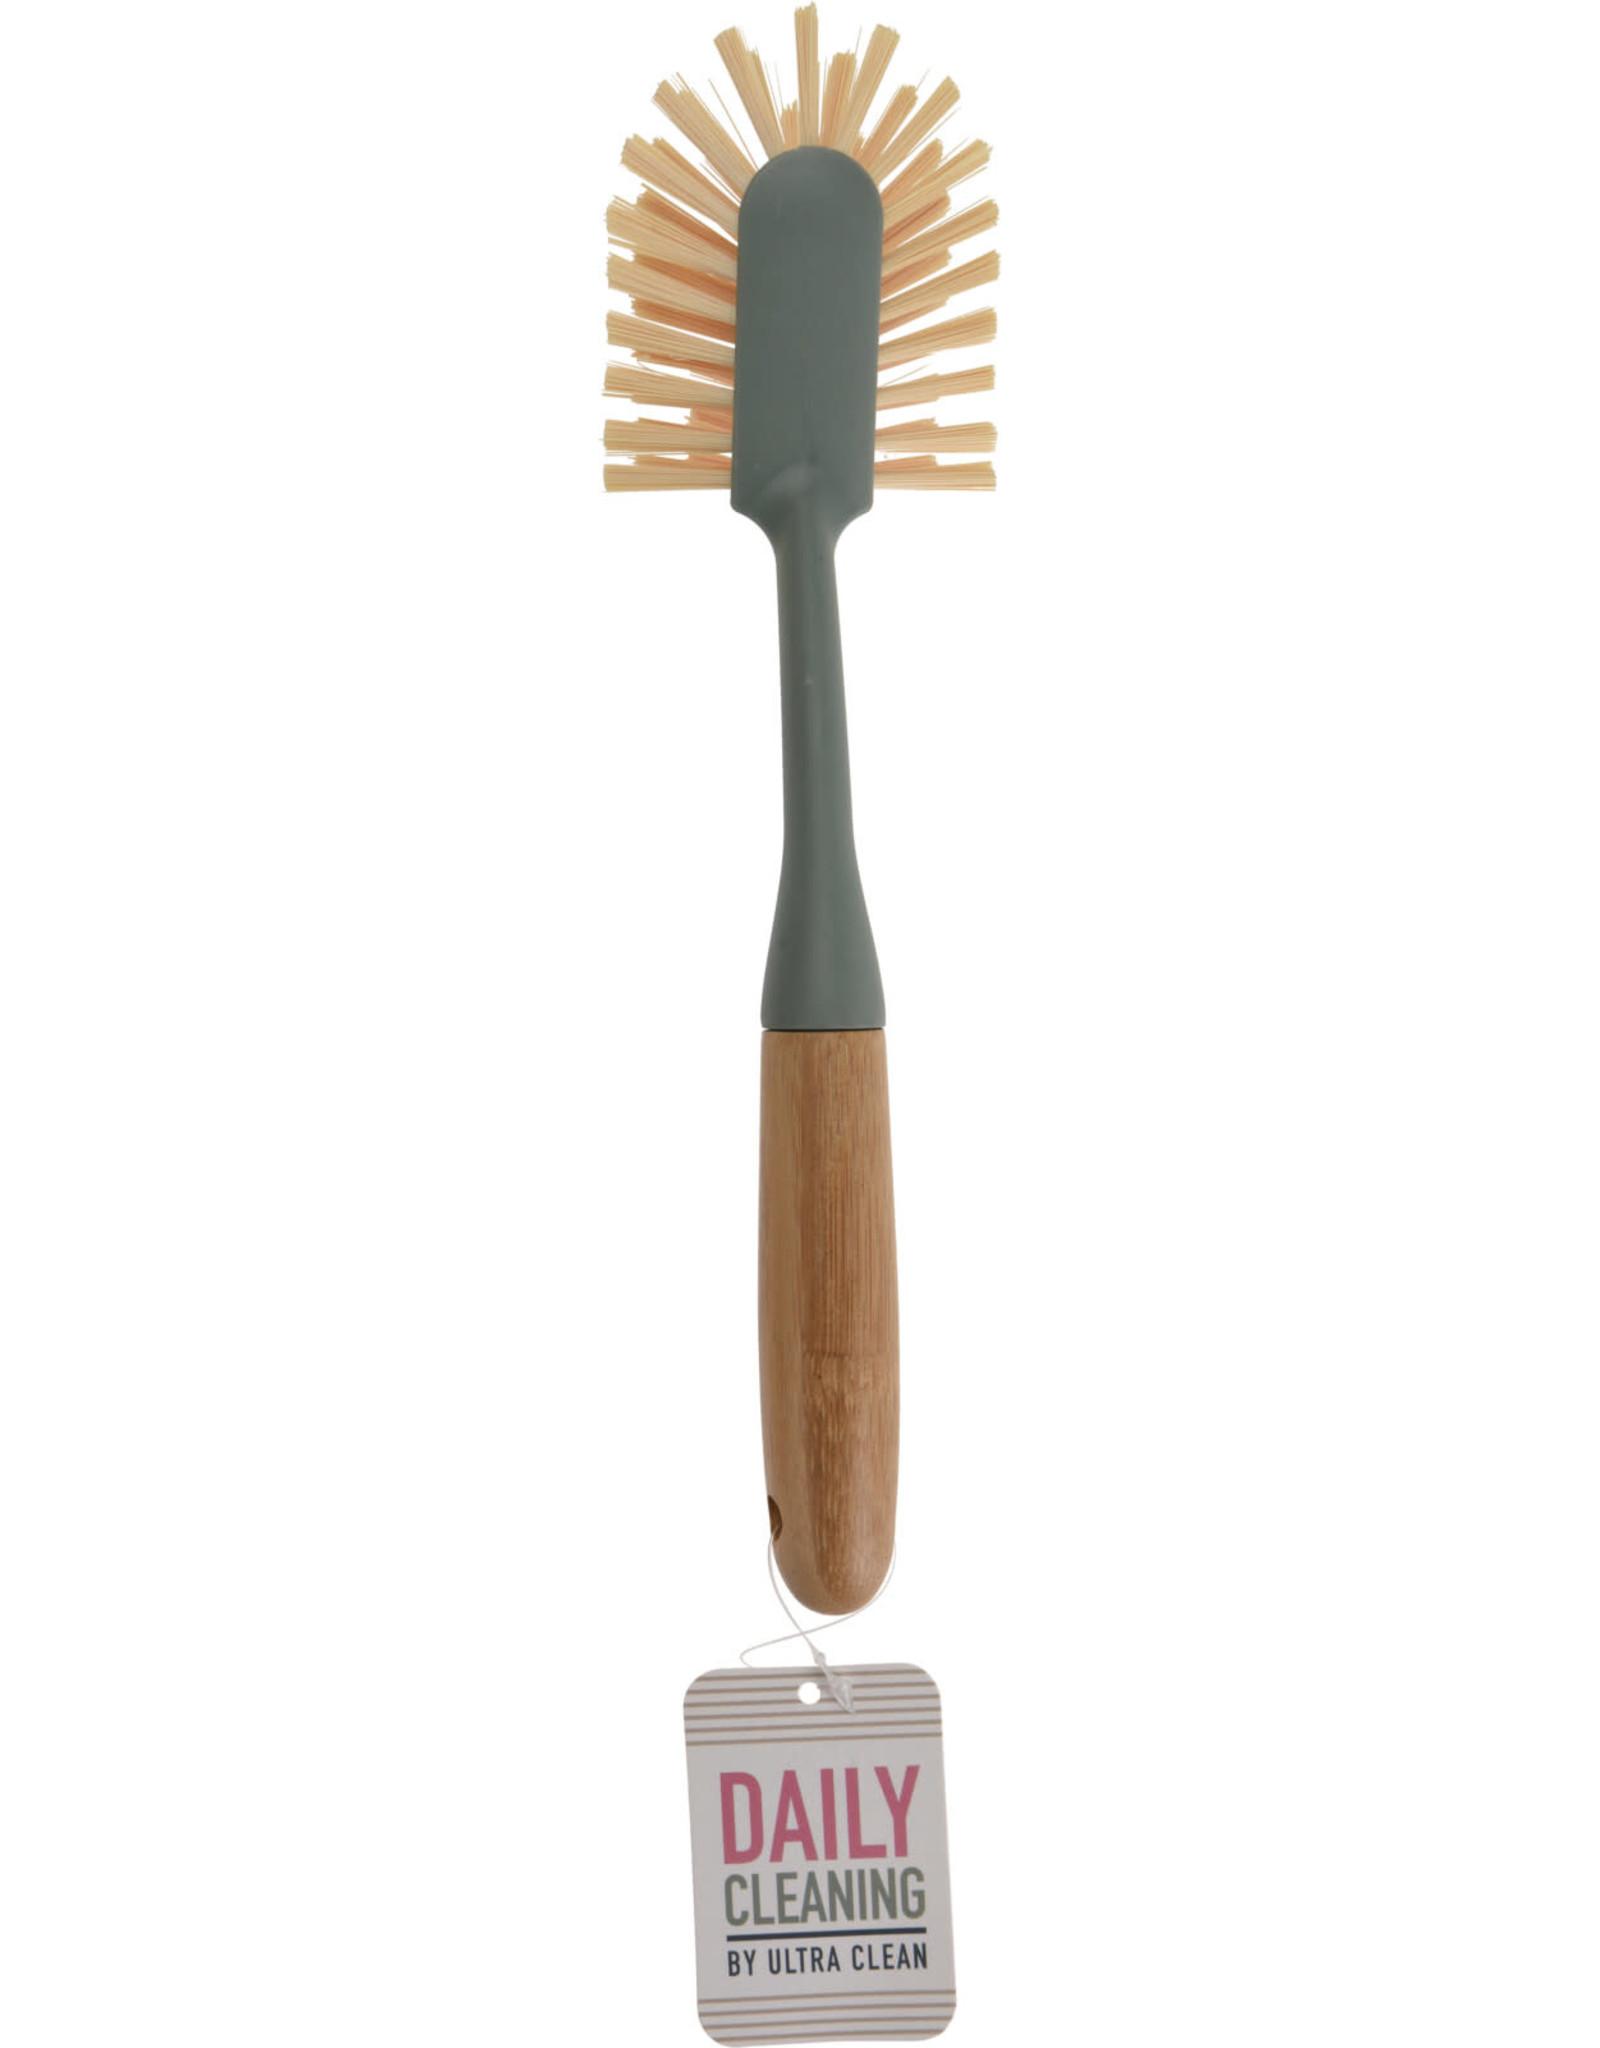 Koopman Dishwash Brush With Bamboo